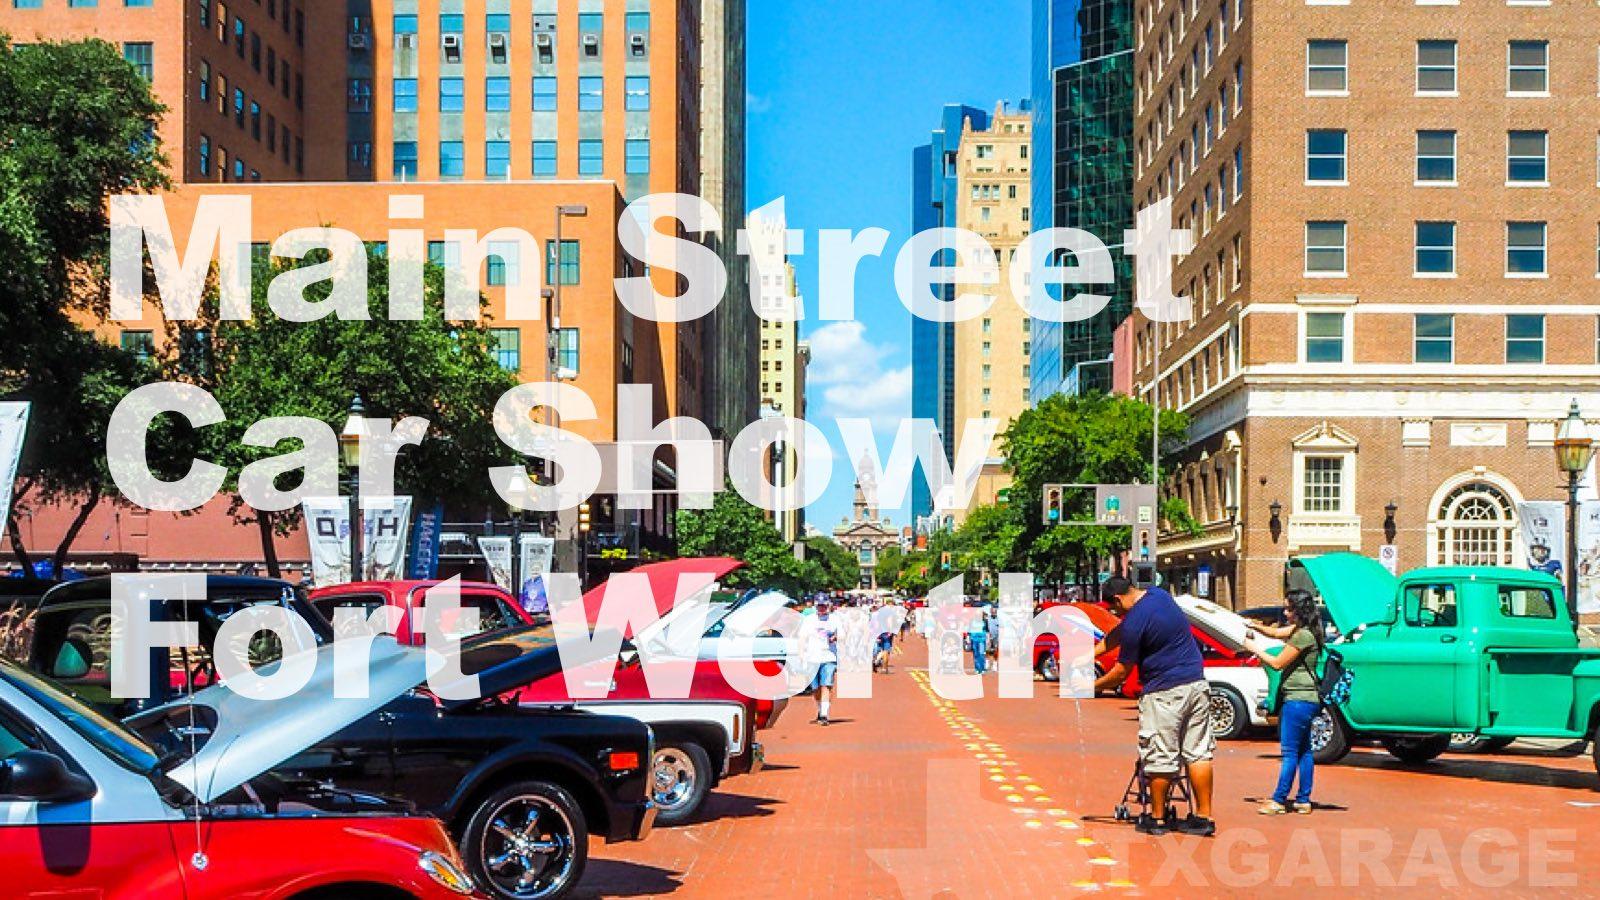 Mainstreetcarshowcover TxGarage - Main street car show